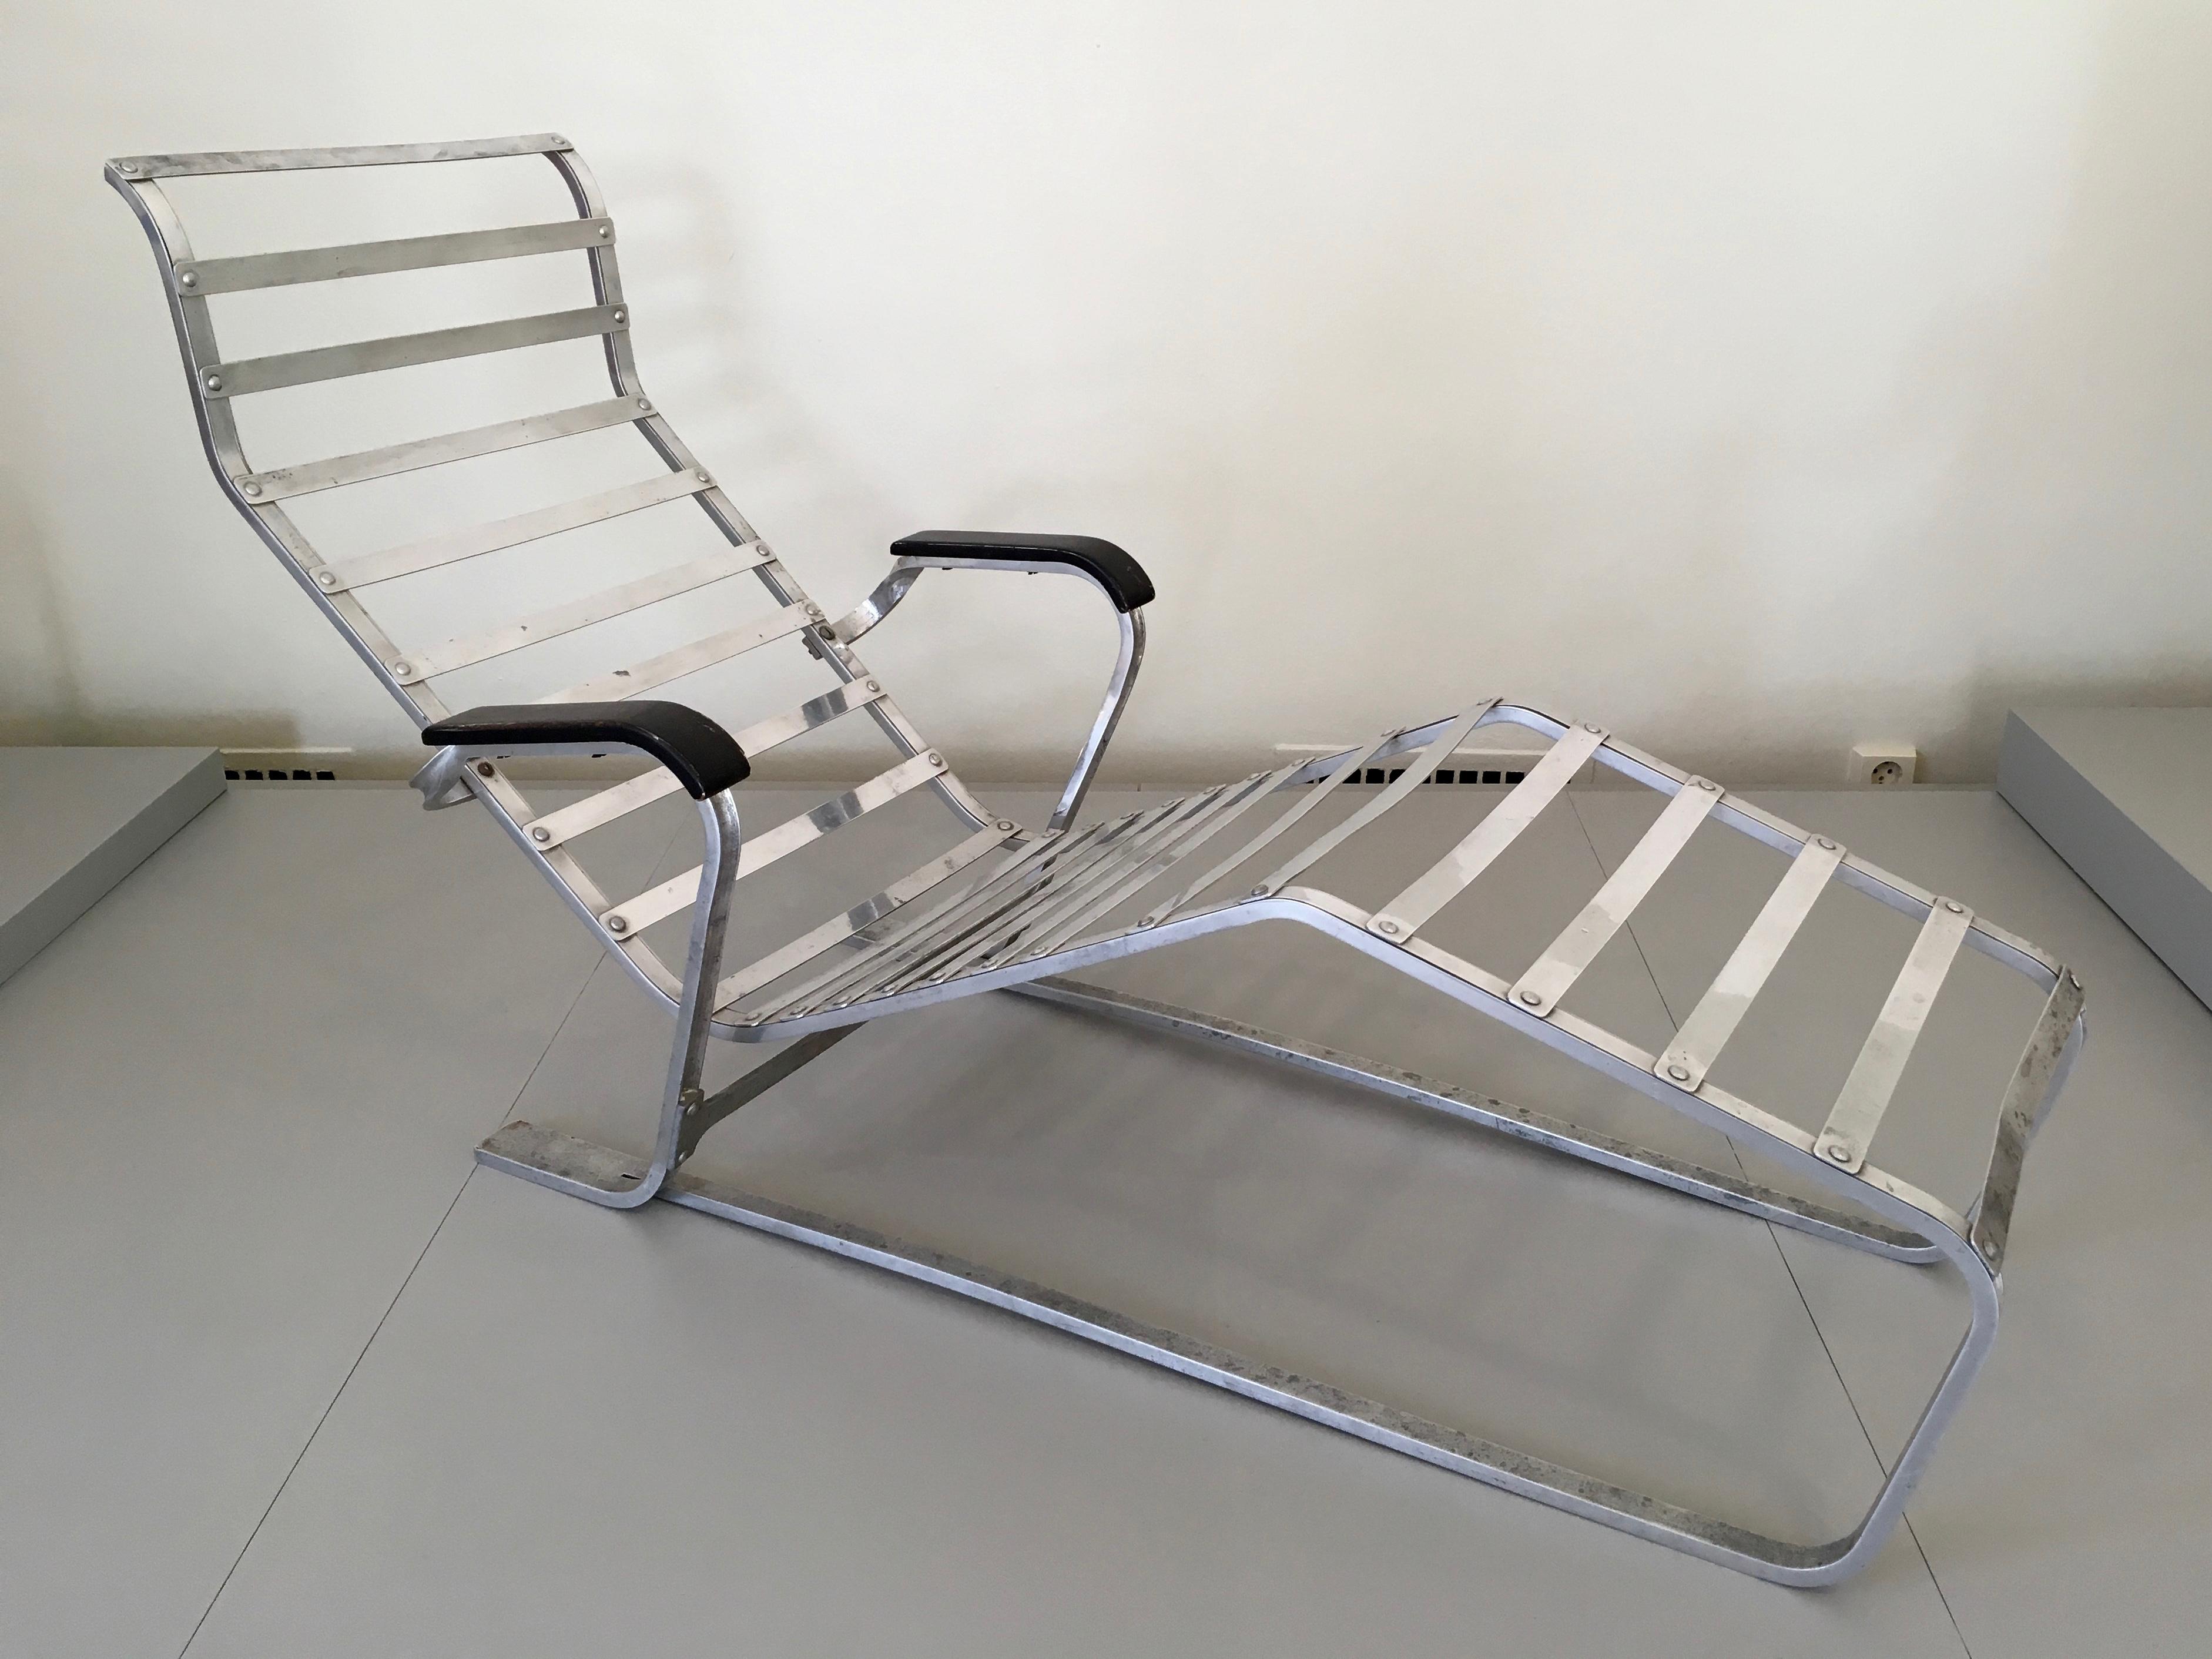 chaiselongue wikipedia File:Marcel Breuer - Chaise longue model 313 - 1932 - Boijmans V 1810  (KNu0026V).jpg